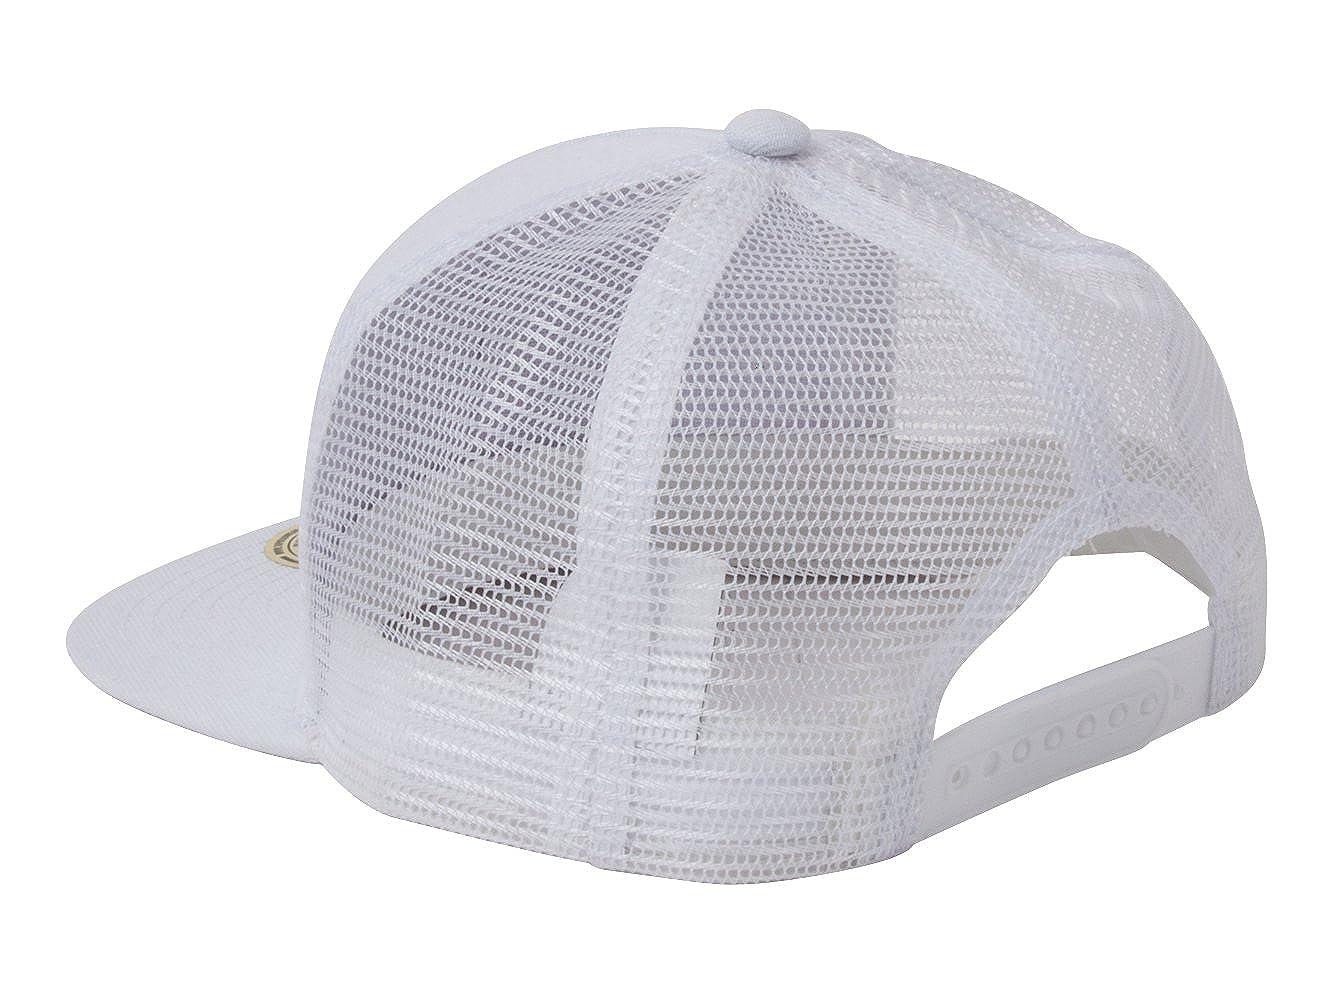 e25ecf069e3 Amazon.com  TOP HEADWEAR USA Flag Flat Bill Trucker Mesh Snapback Hat -  White  Clothing